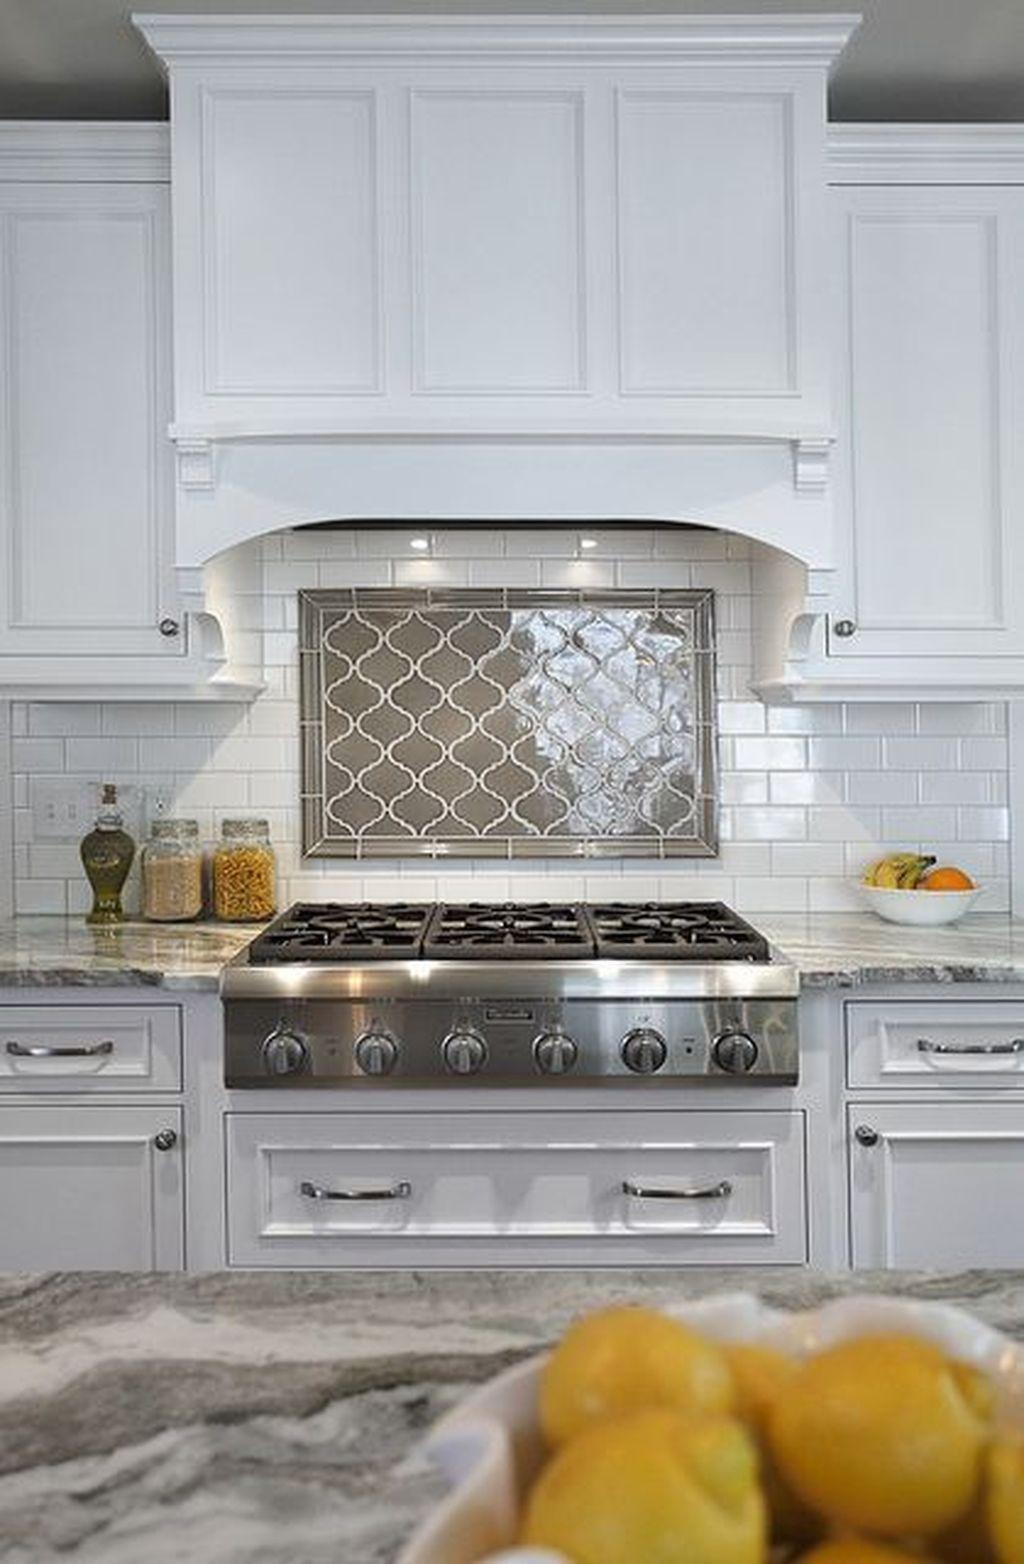 20 Amazing Kitchen Tile Backsplash Ideas Kitchen Backsplash